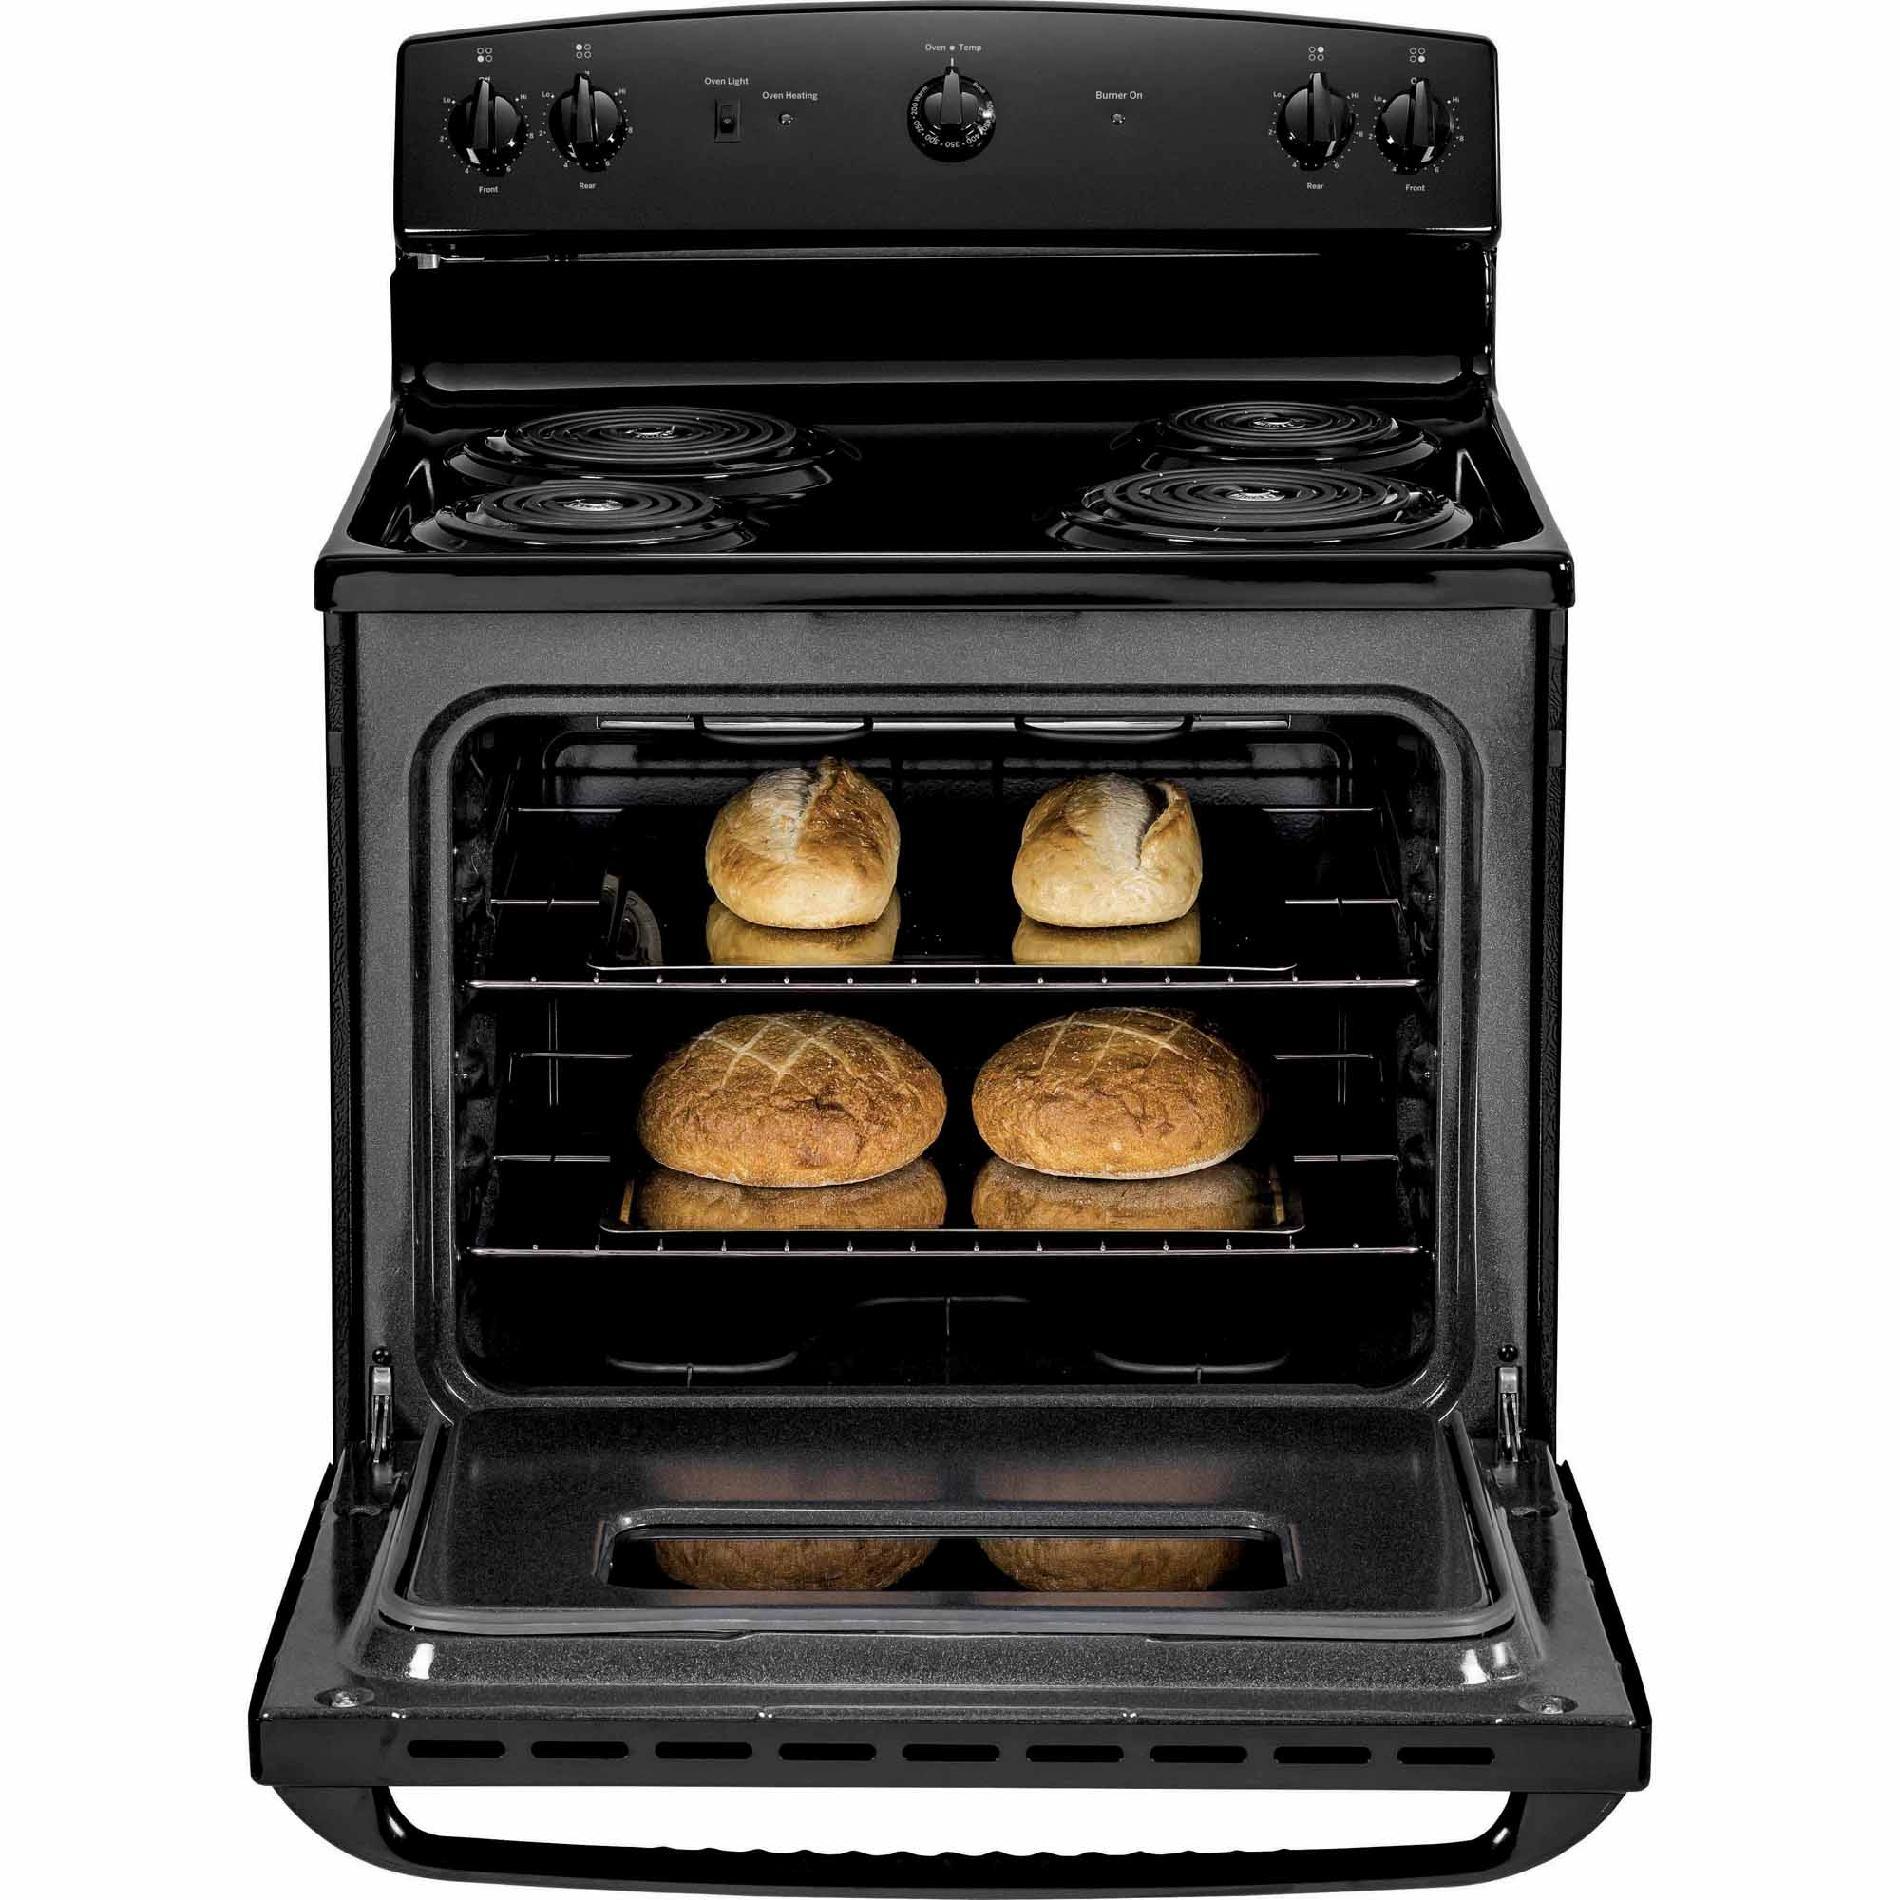 GE Appliances JBS10DFBB 5.0 cu. ft. Electric Range - Black